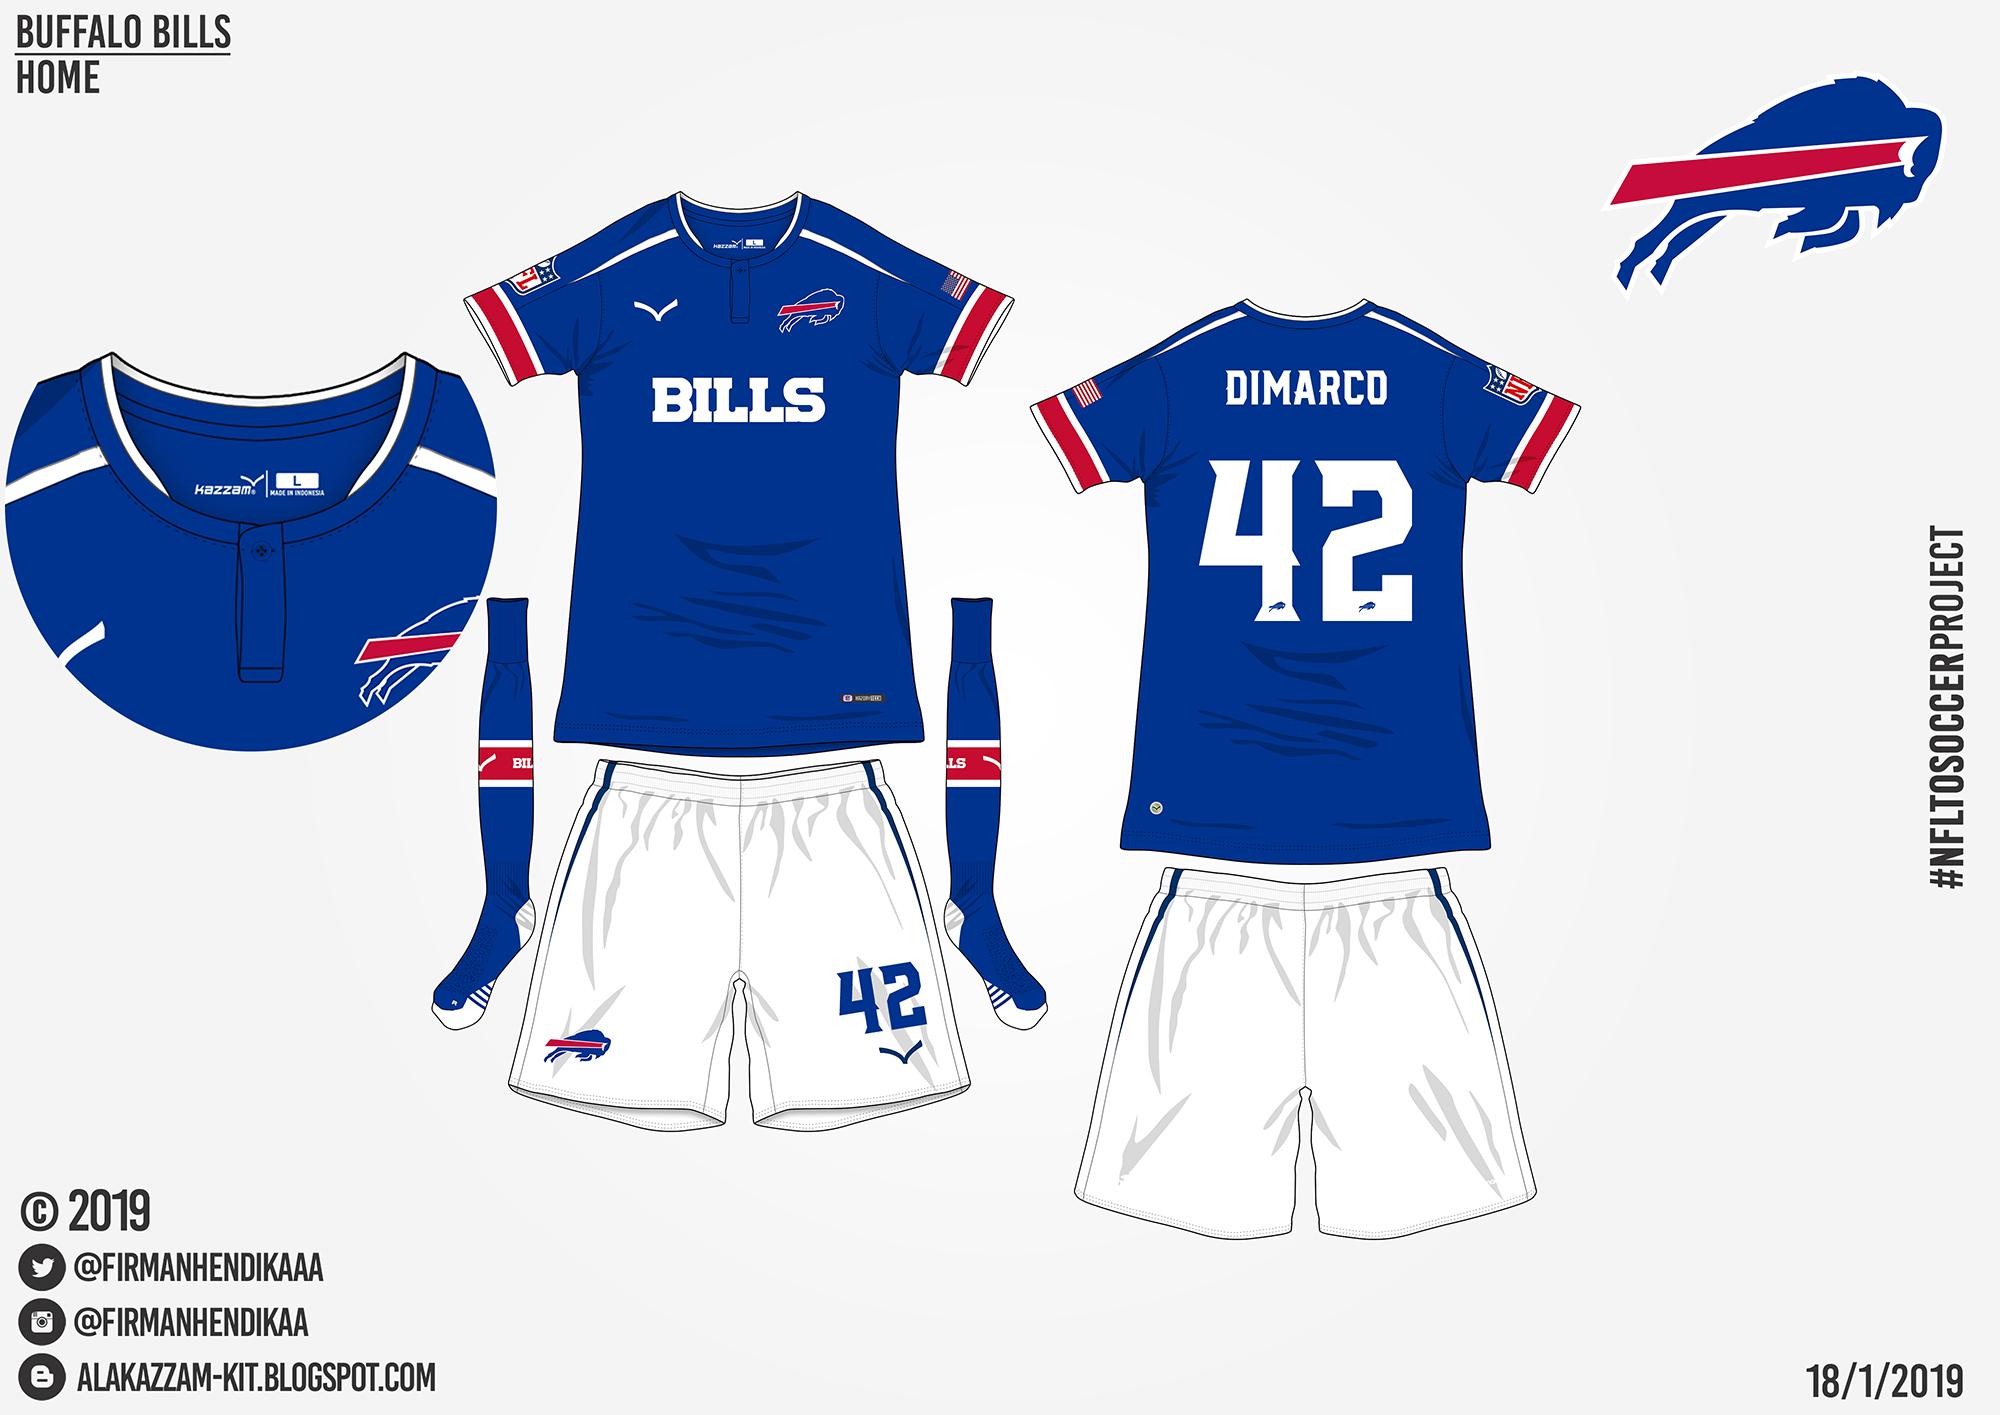 buffalo bills home and away jerseys